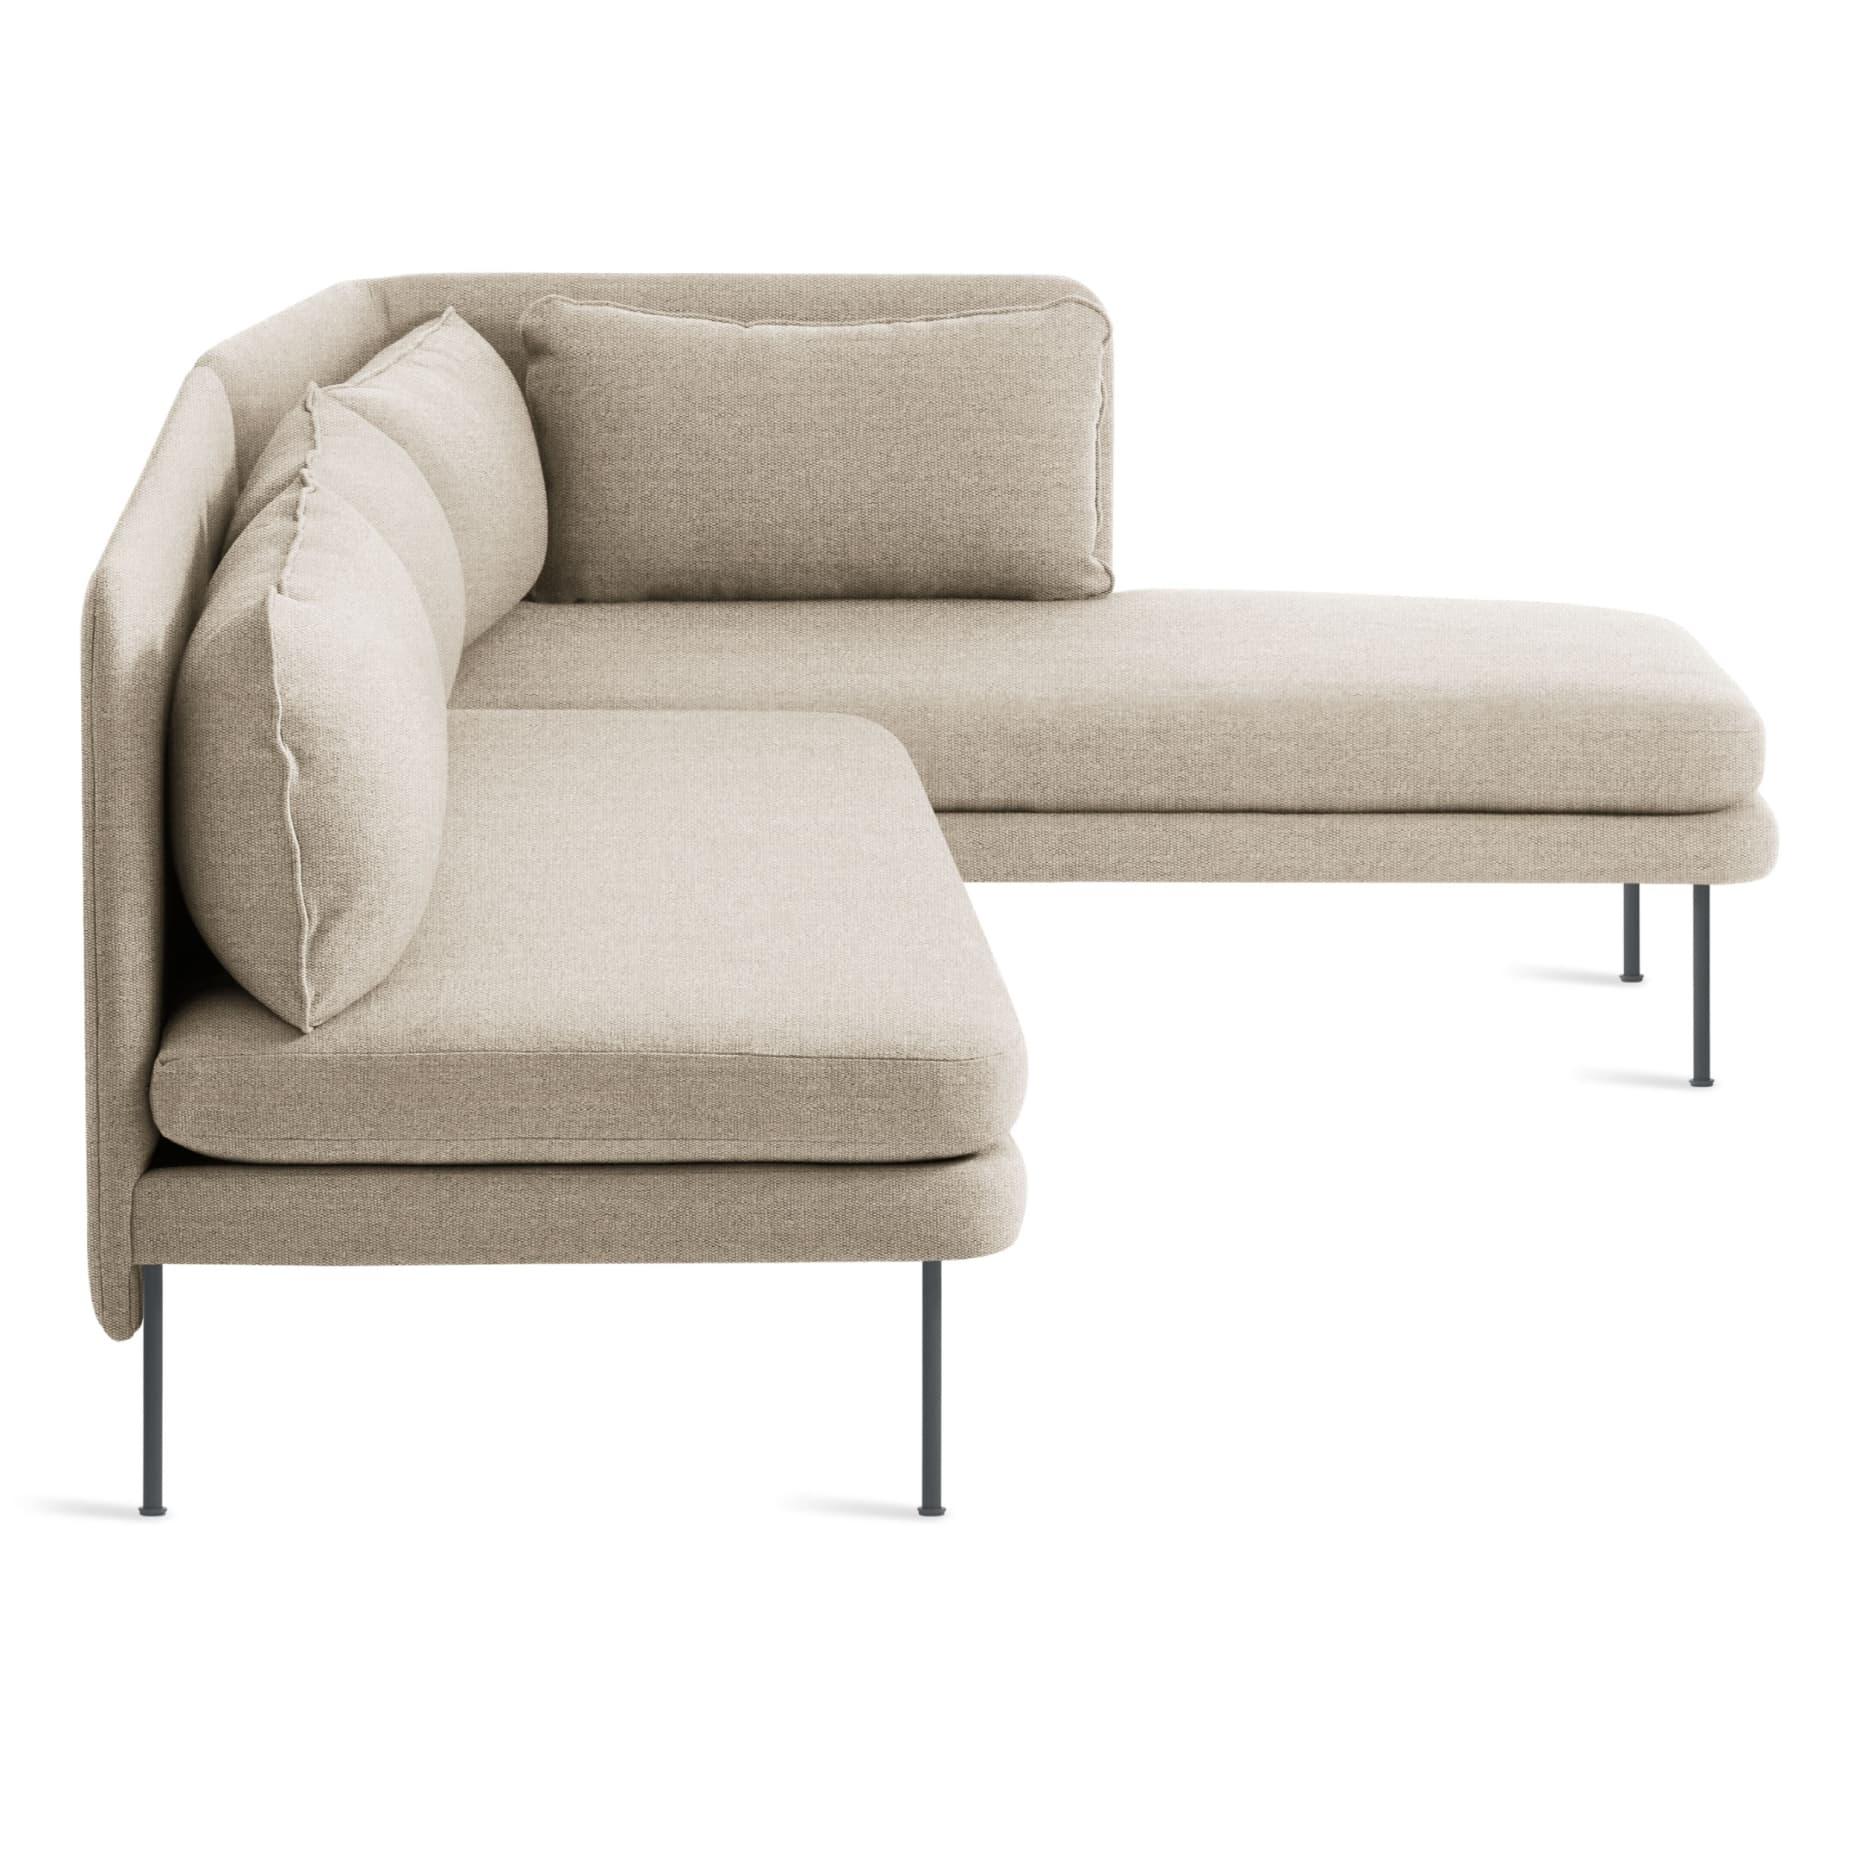 bl1 rchnam st sidehigh bloke armless sofa w right chaise tait stone